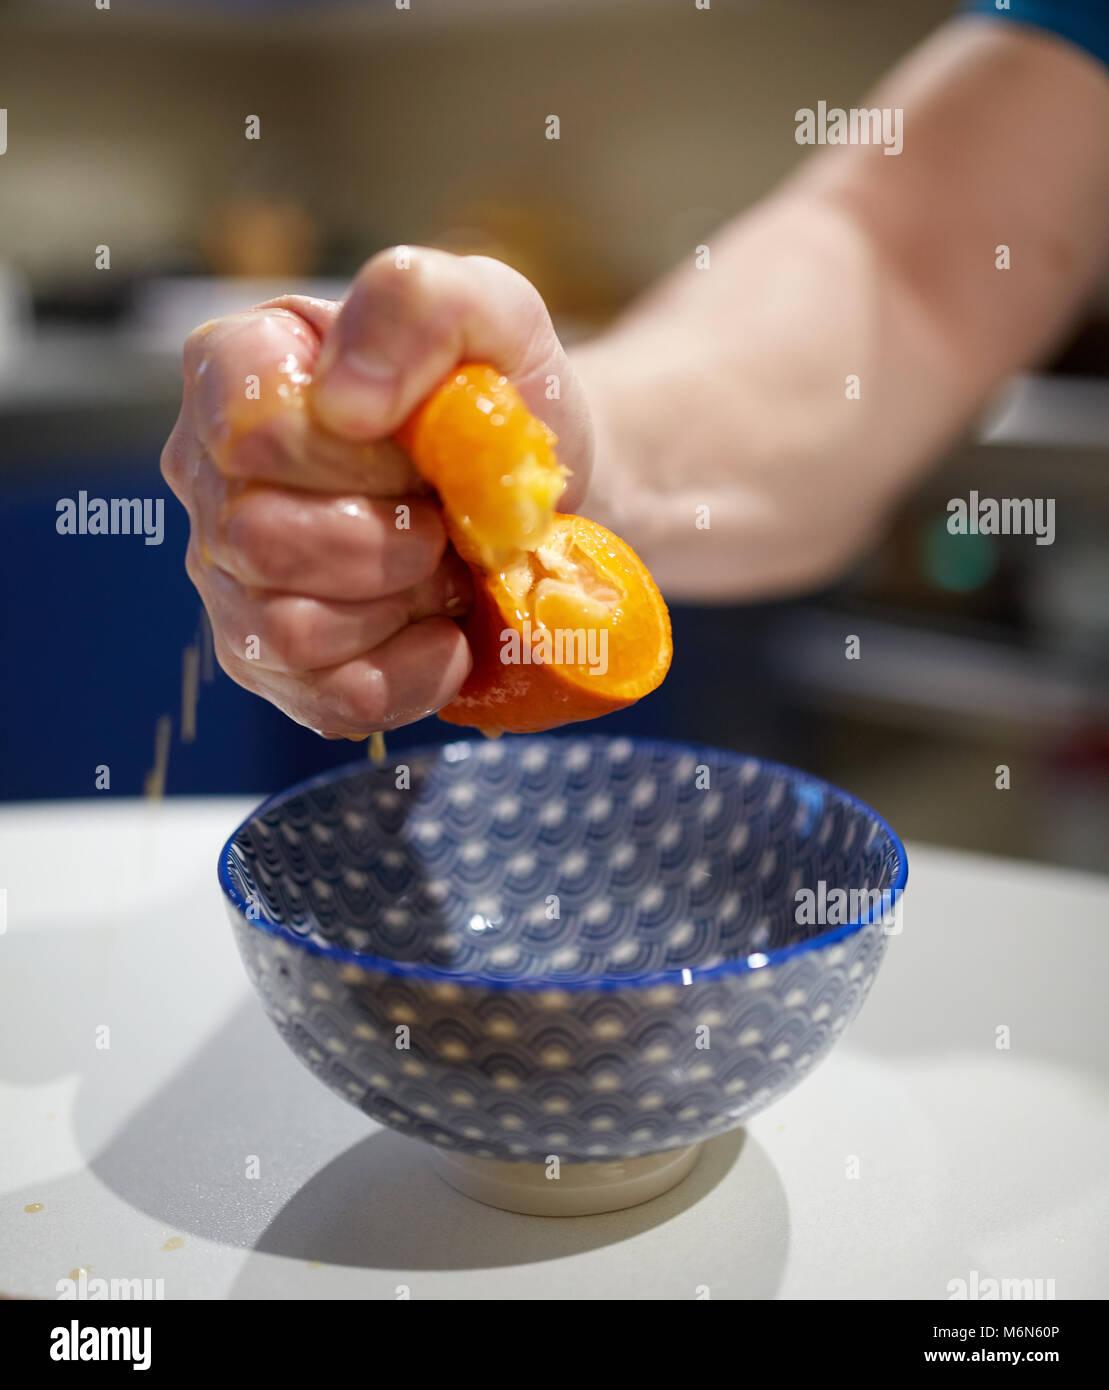 Man's hand furiously squashing an orange into a bowl - Stock Image